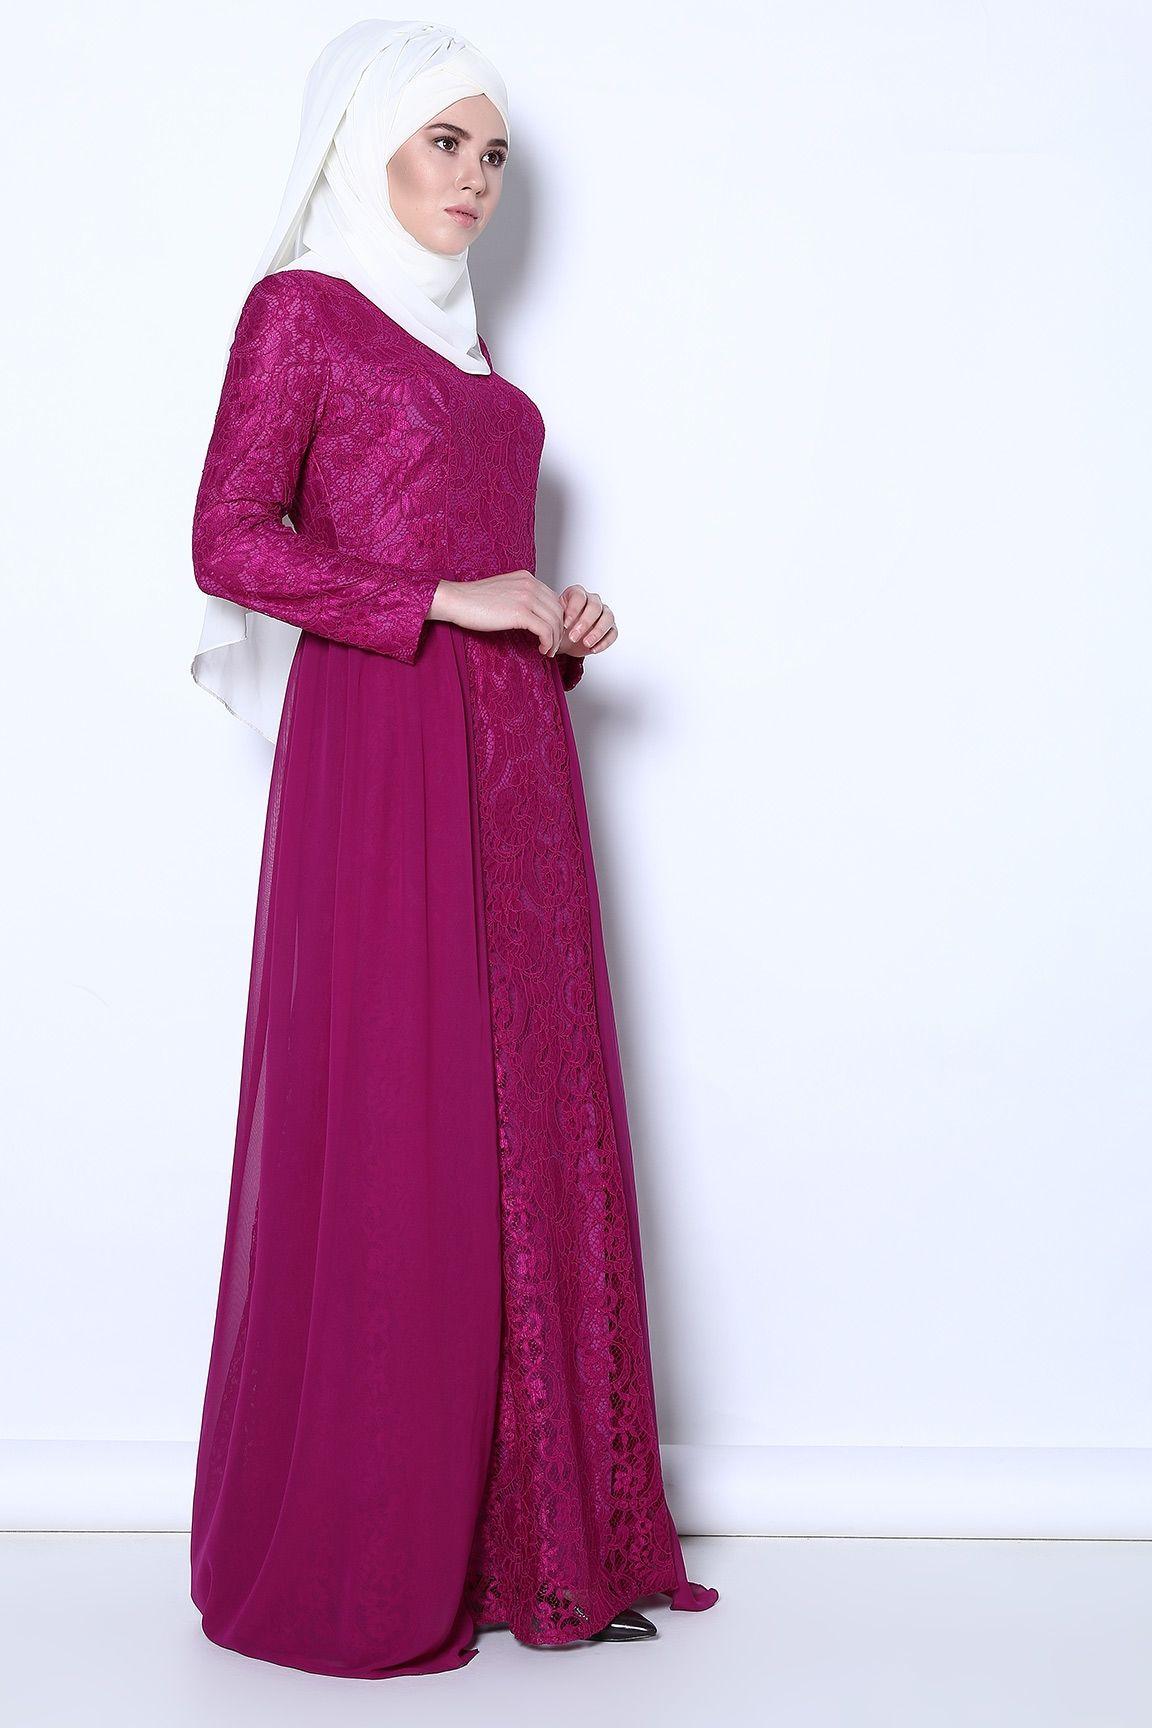 Pudra Sirt Fermuarli Dantelli Elbise Tozlugiyim Com Tr Elbise Modelleri Elbise Moda Stilleri